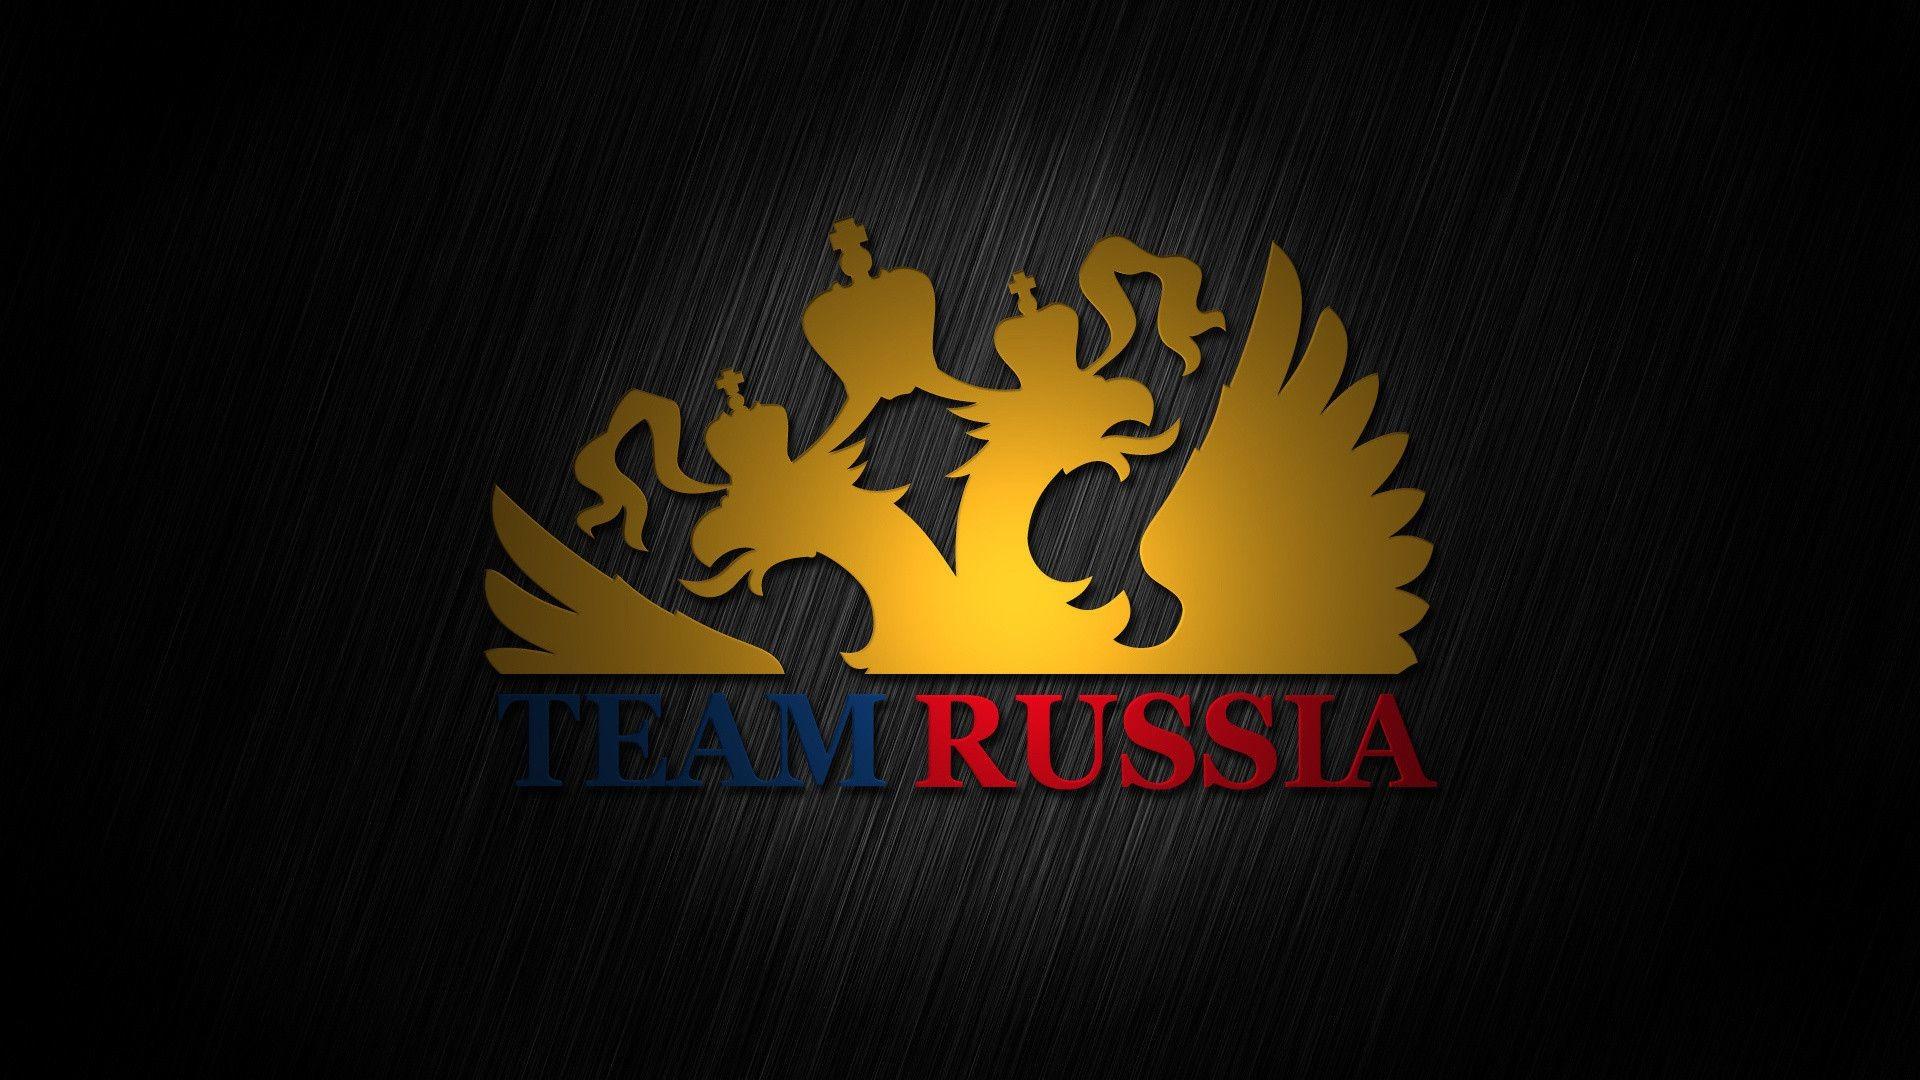 russia football team logo | Free HD Wallpaper 2013 Desktop Background